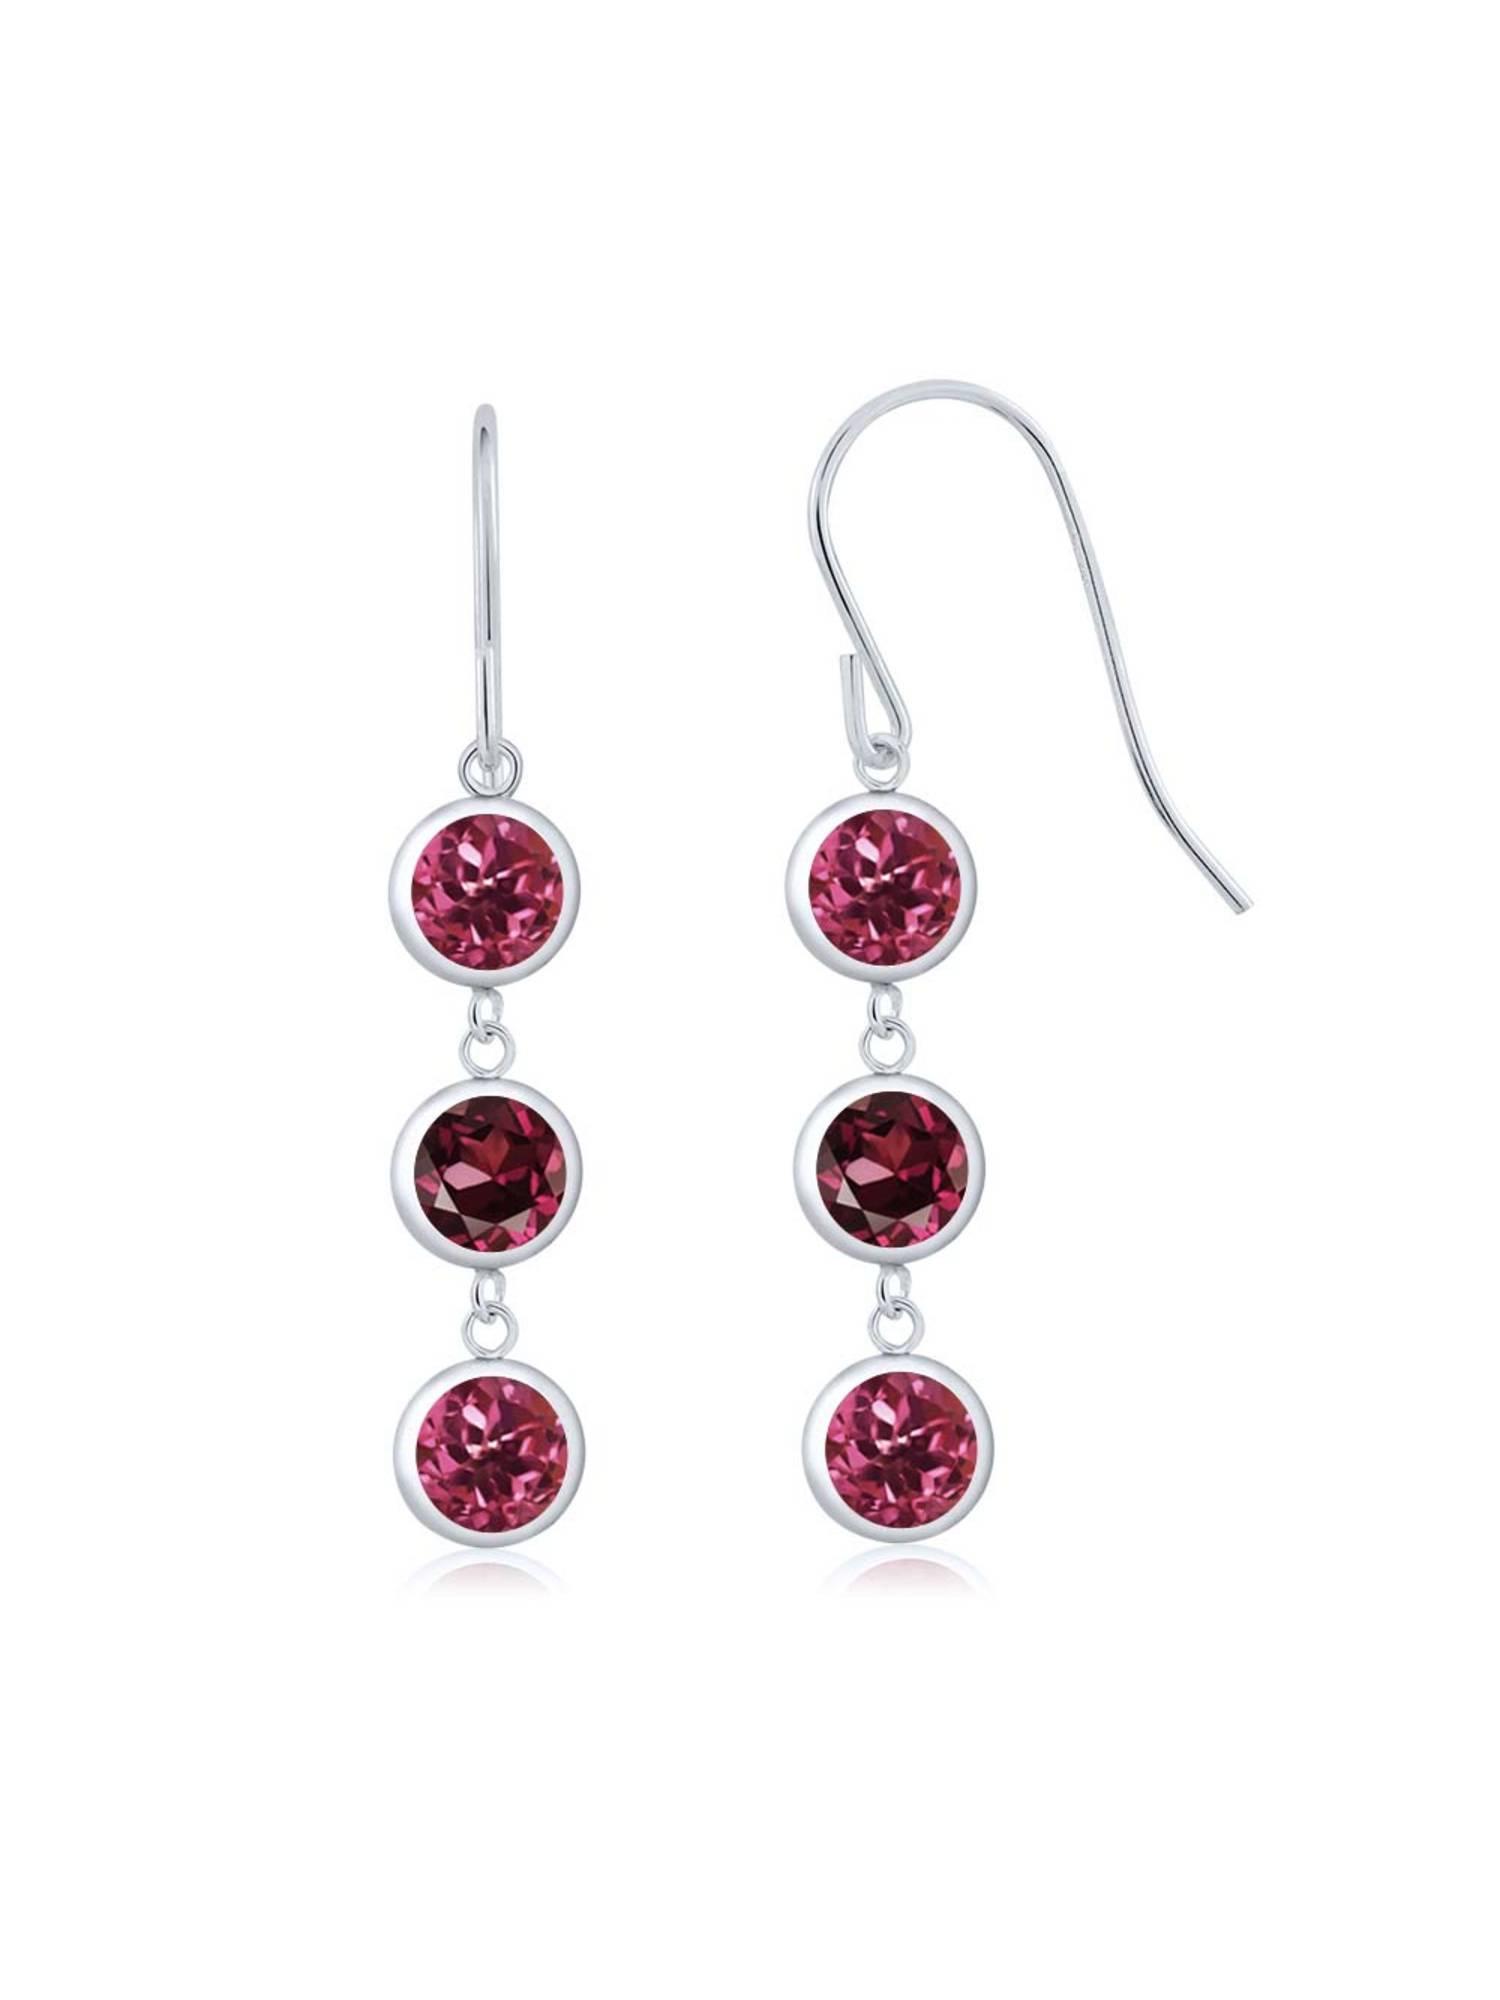 3.20 Ct Round Pink Tourmaline Red Rhodolite Garnet 925 Sterling Silver Earrings by